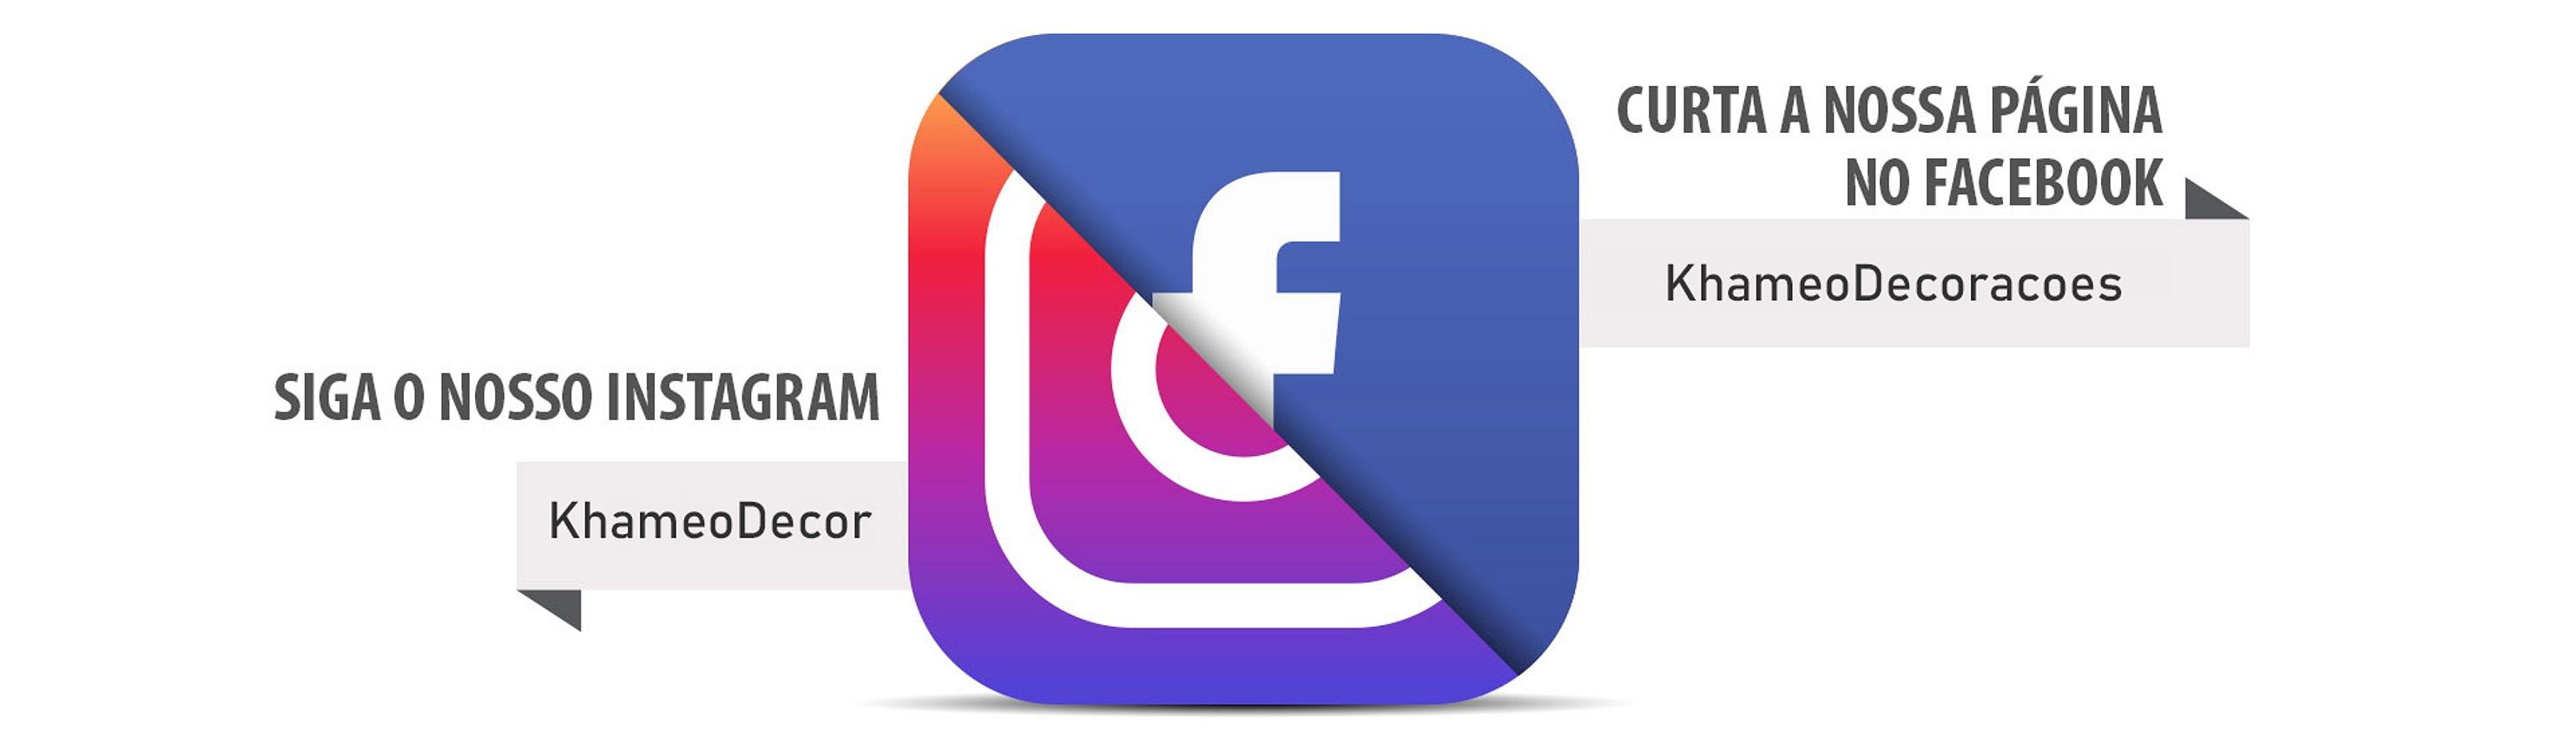 Siga-nos nas redes sociais